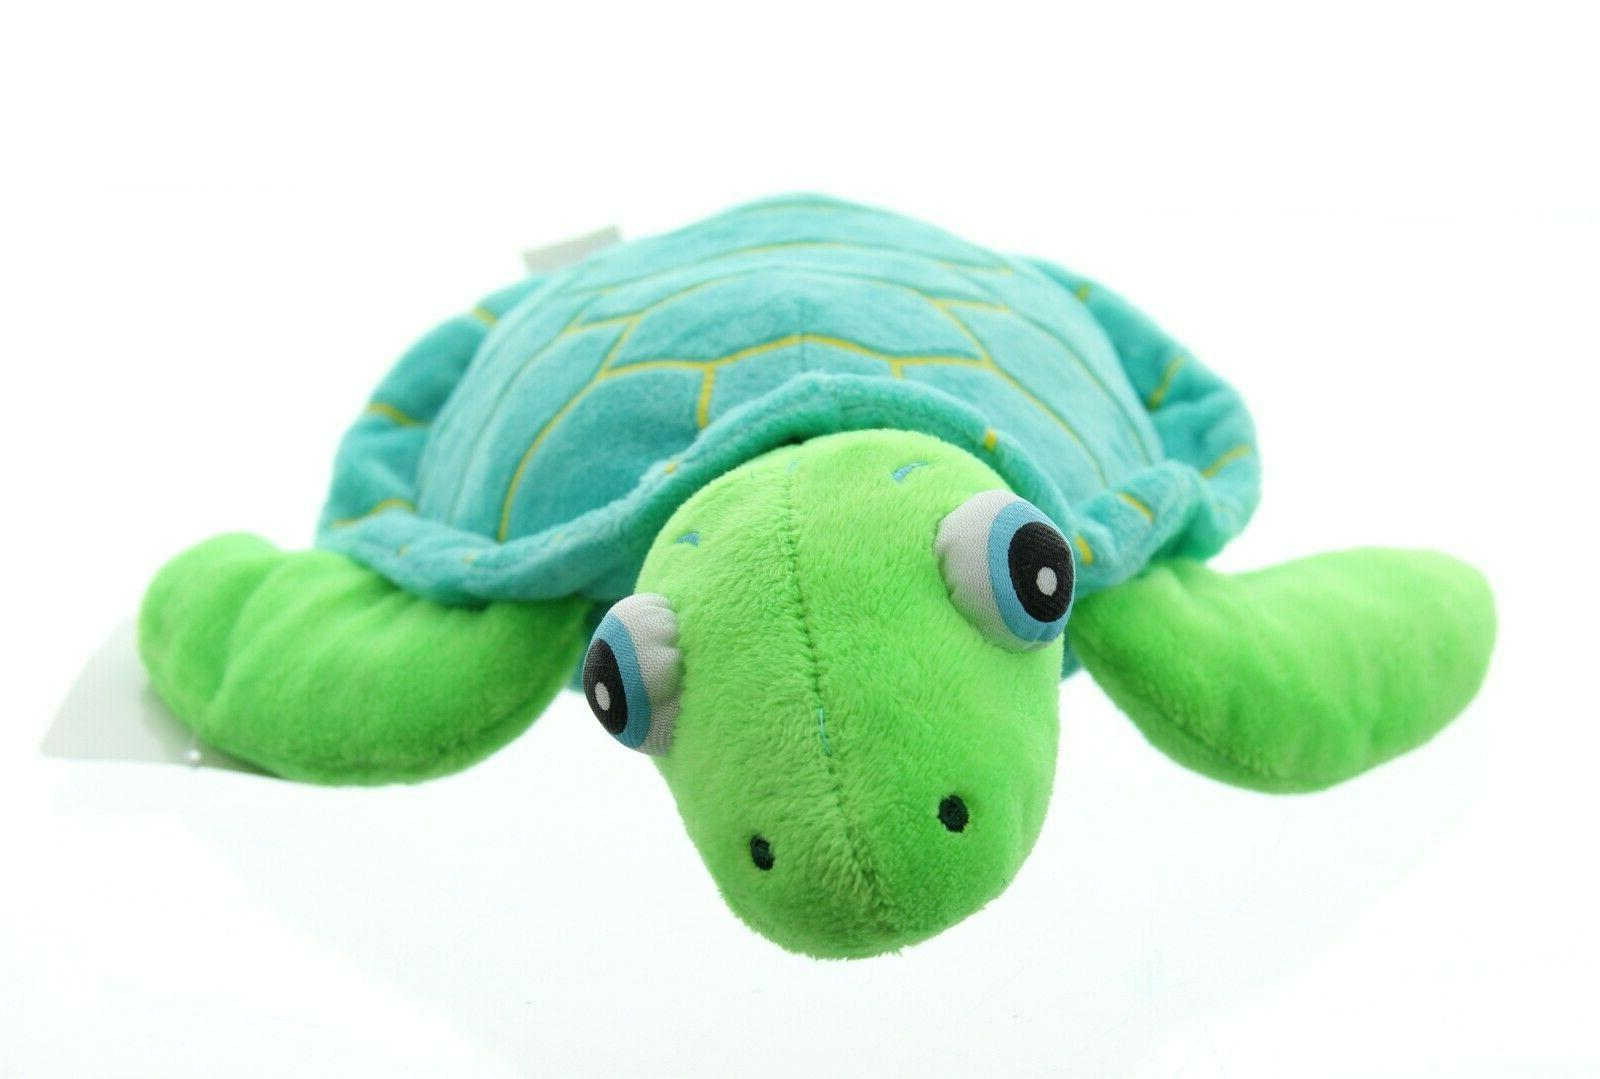 Fiesta Night Buddies Ally the Turtle Plush Animal 3